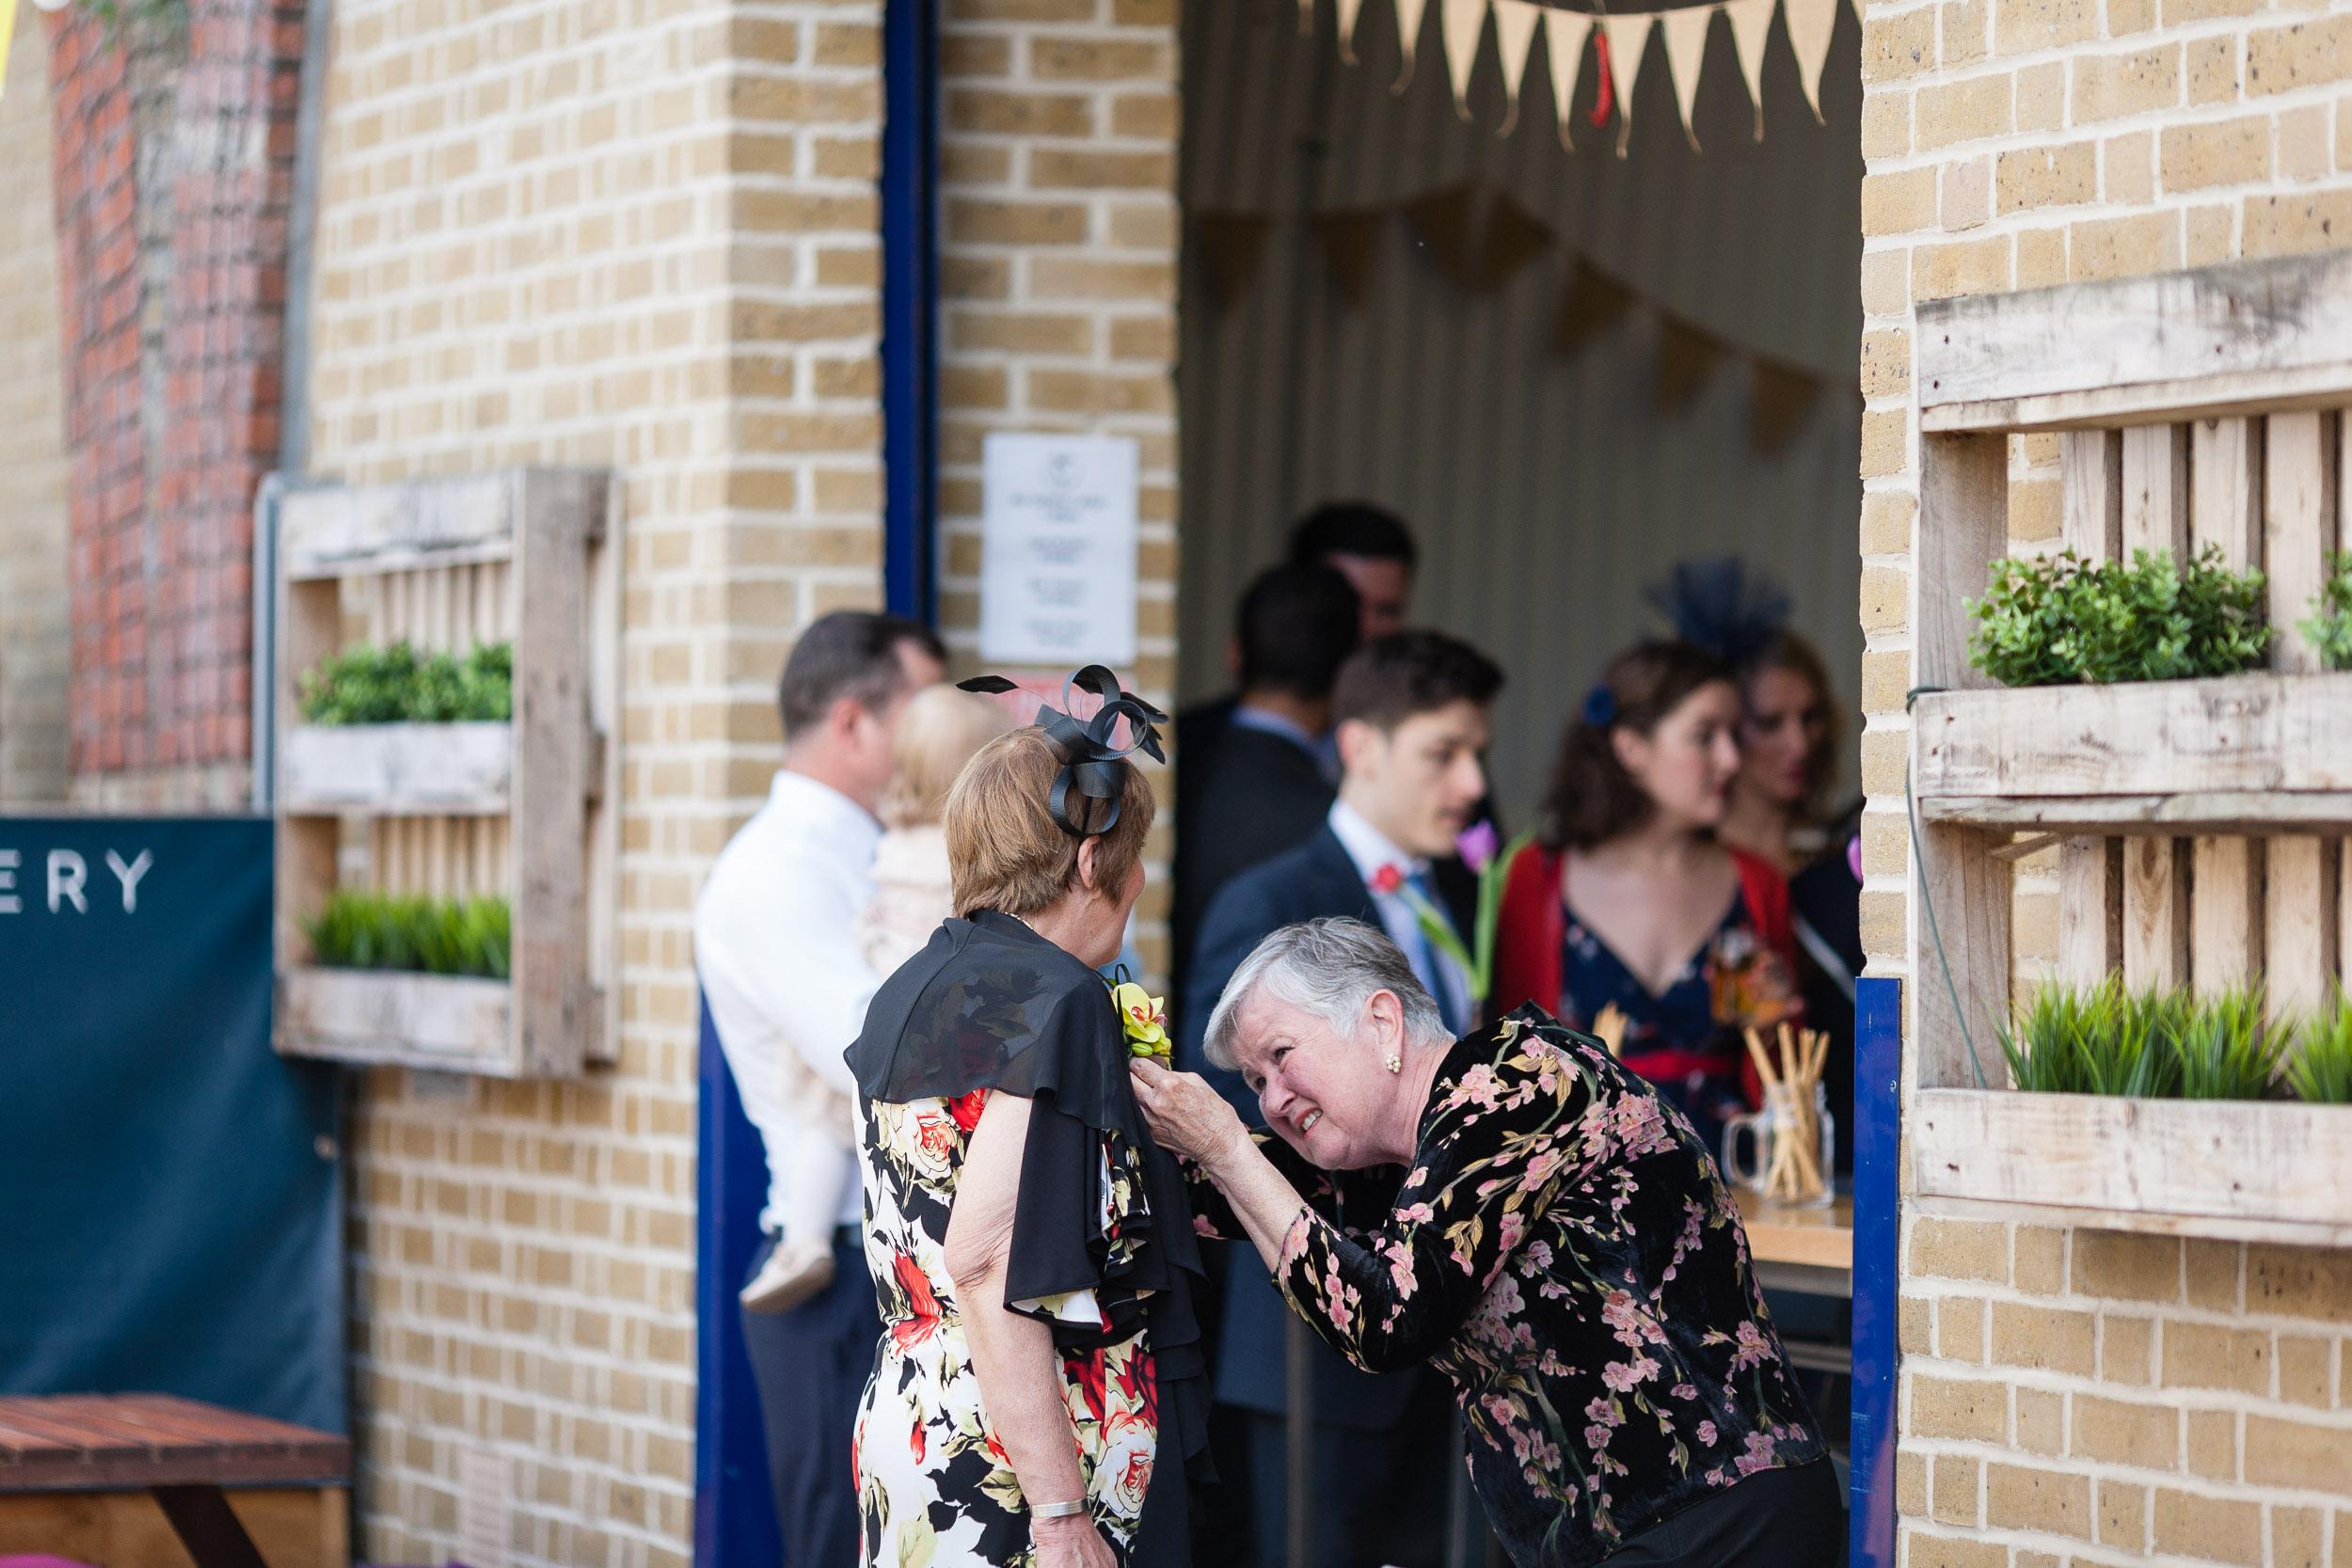 brockwell-lido-brixton-herne-hill-wedding-026.jpg